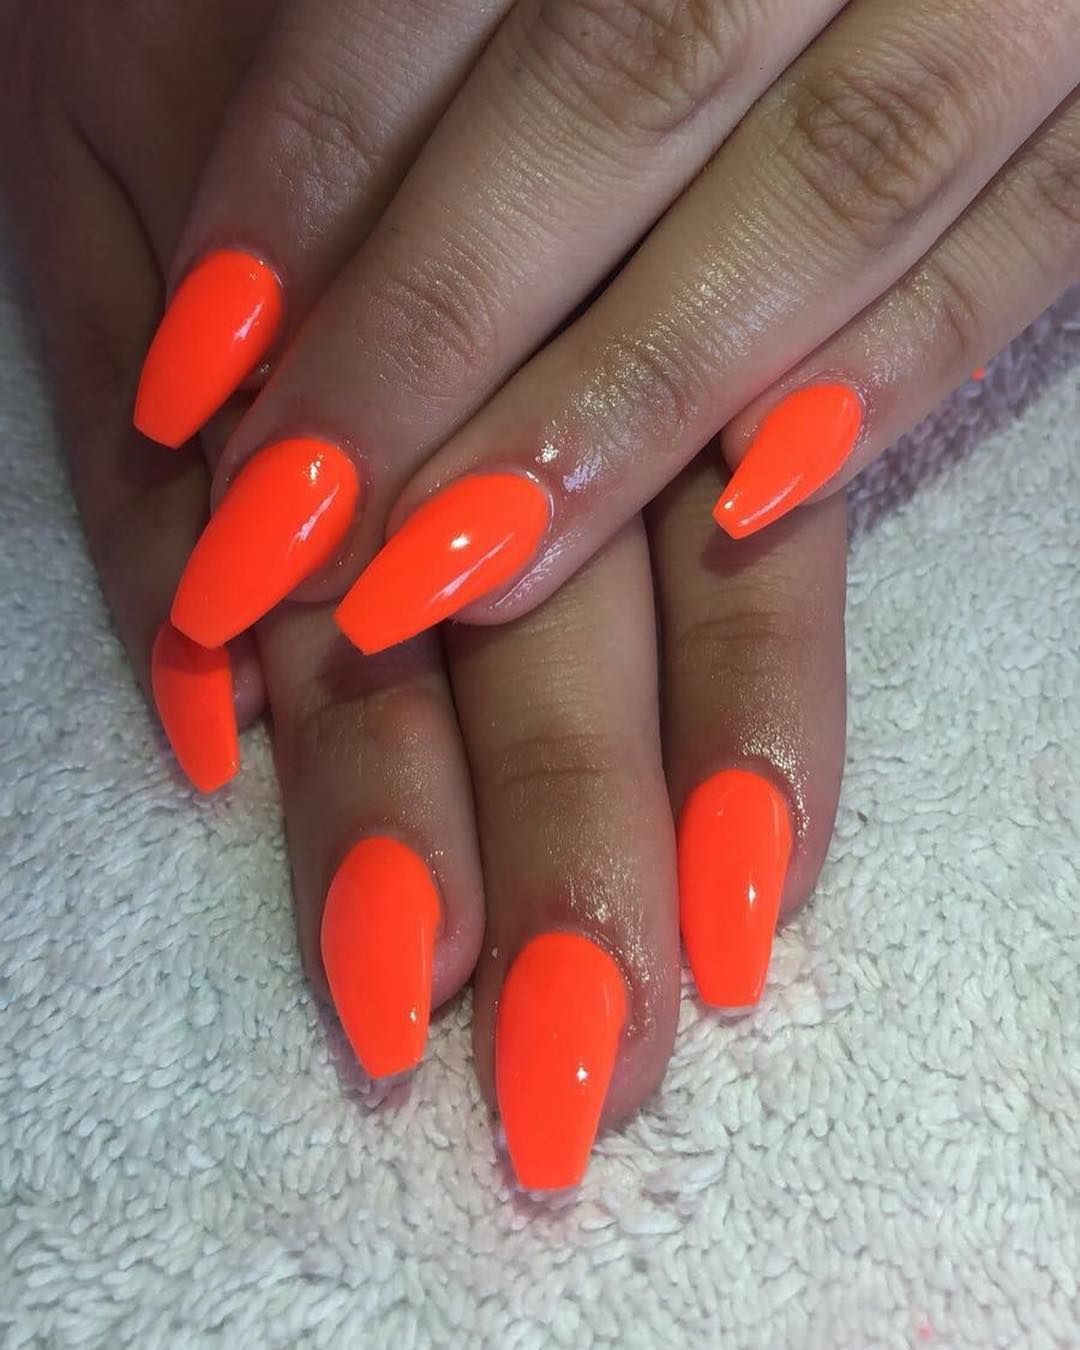 Neon Orange Acrylics Gelish Gelishnails Mobilenailtech Nails